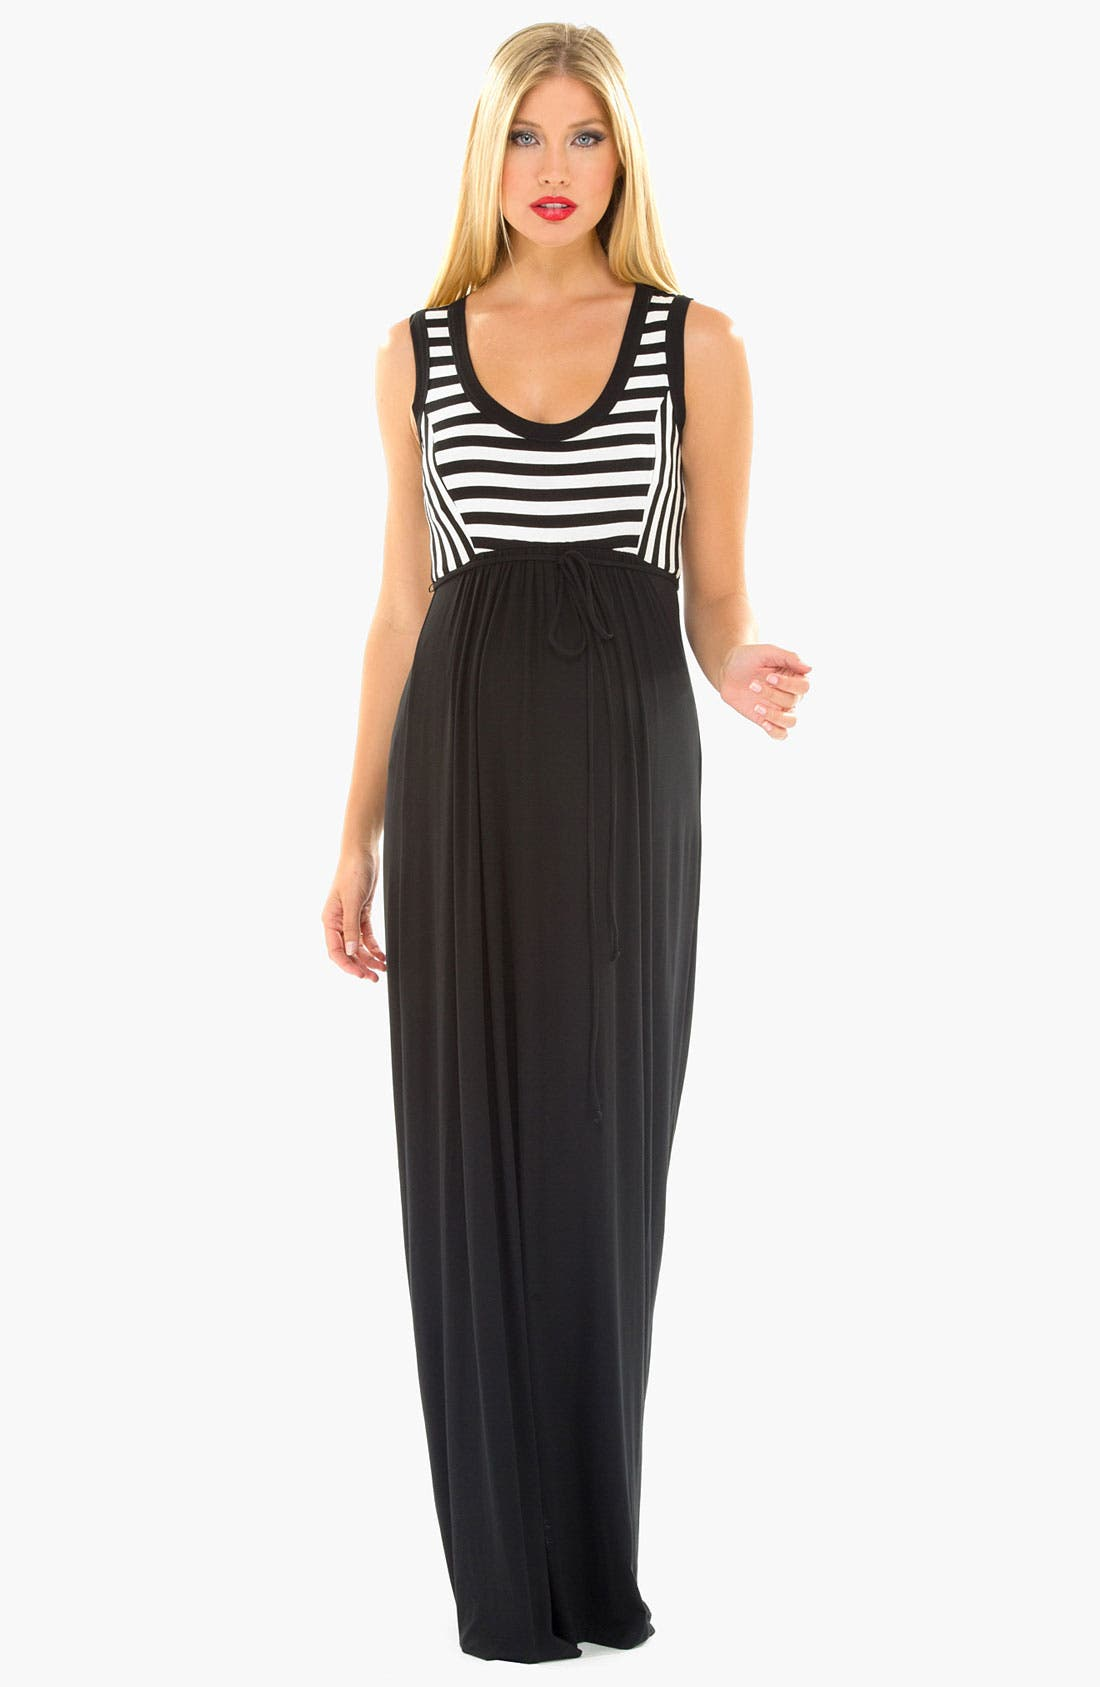 Main Image - Olian Stripe Knit Maternity Maxi Dress